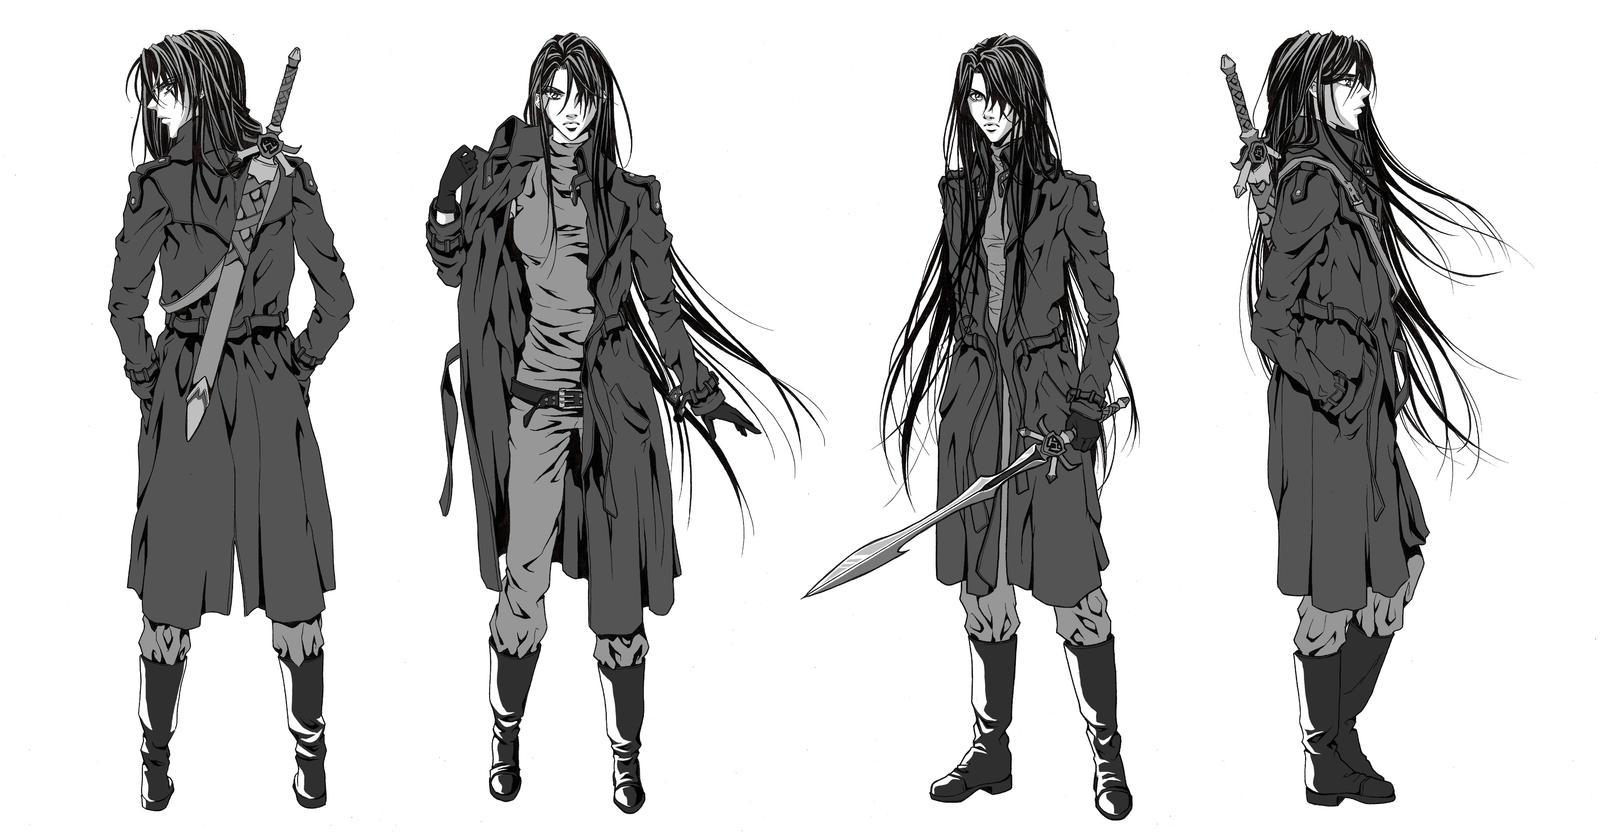 Anime Character Design Sketch : Character sketches by zanariya on deviantart